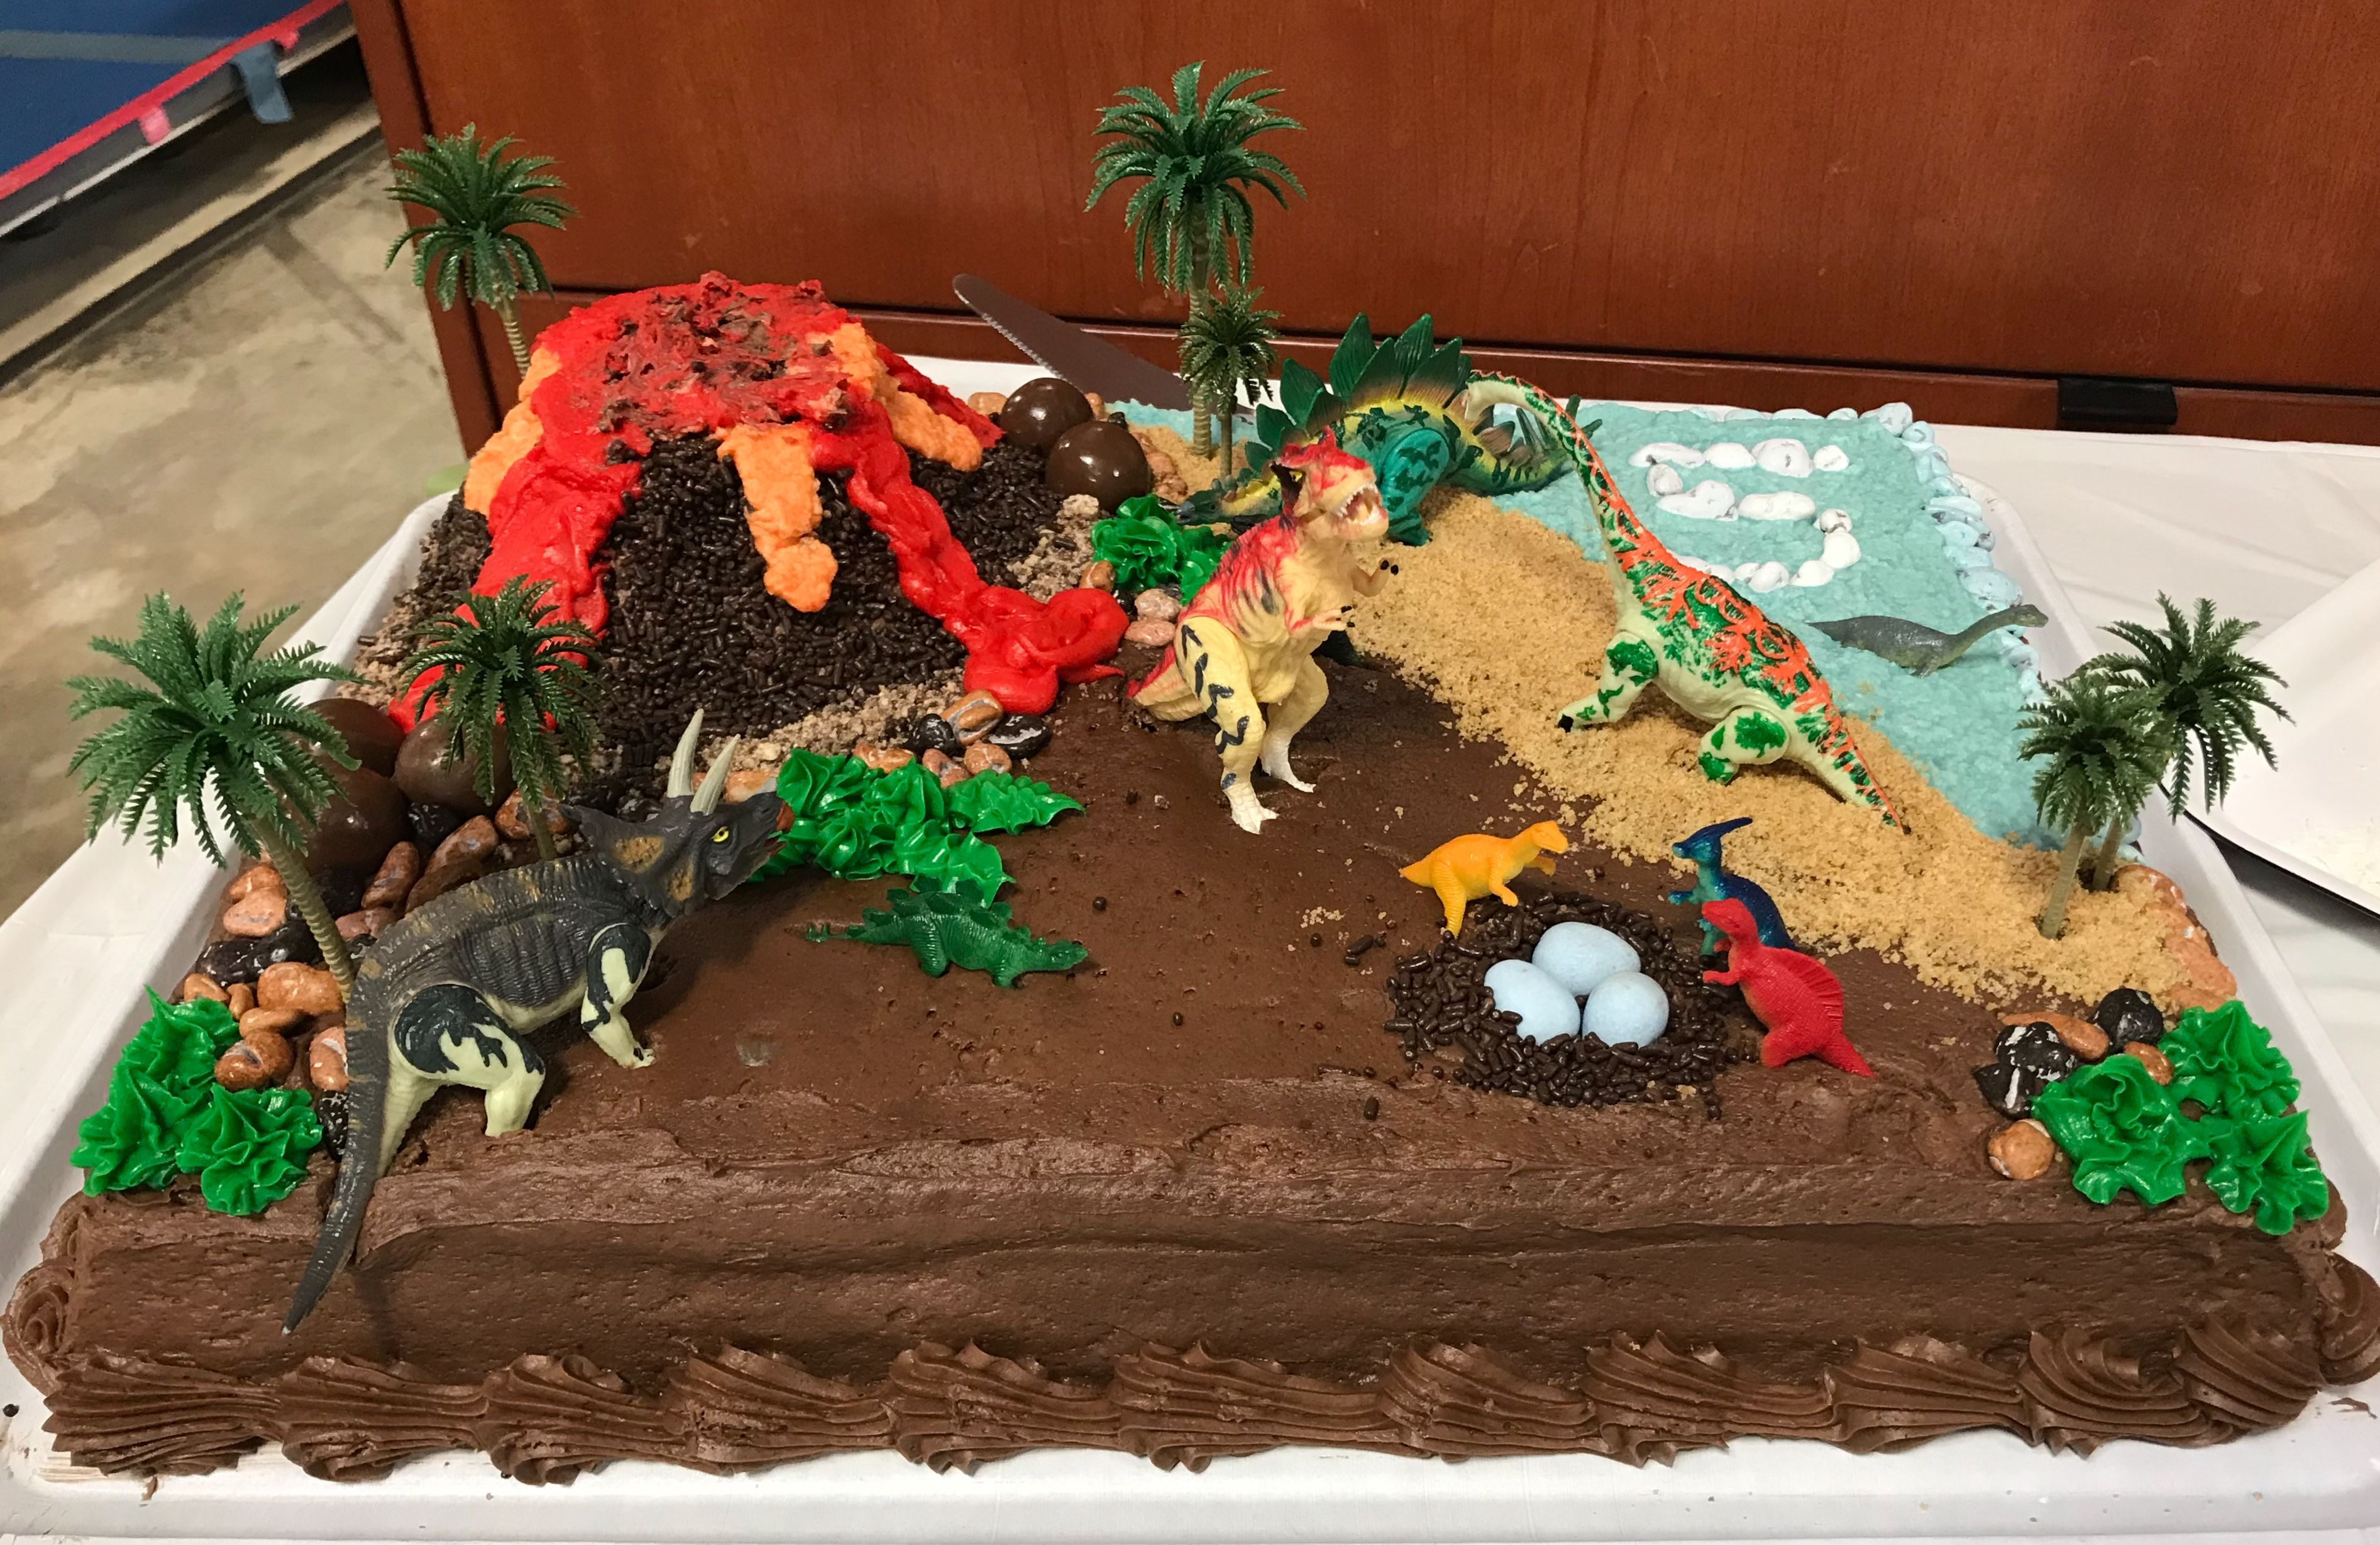 Fabulous Carters 5Th Birthday Diy Dinosaur Cake Sheet Cake From Costco Funny Birthday Cards Online Overcheapnameinfo